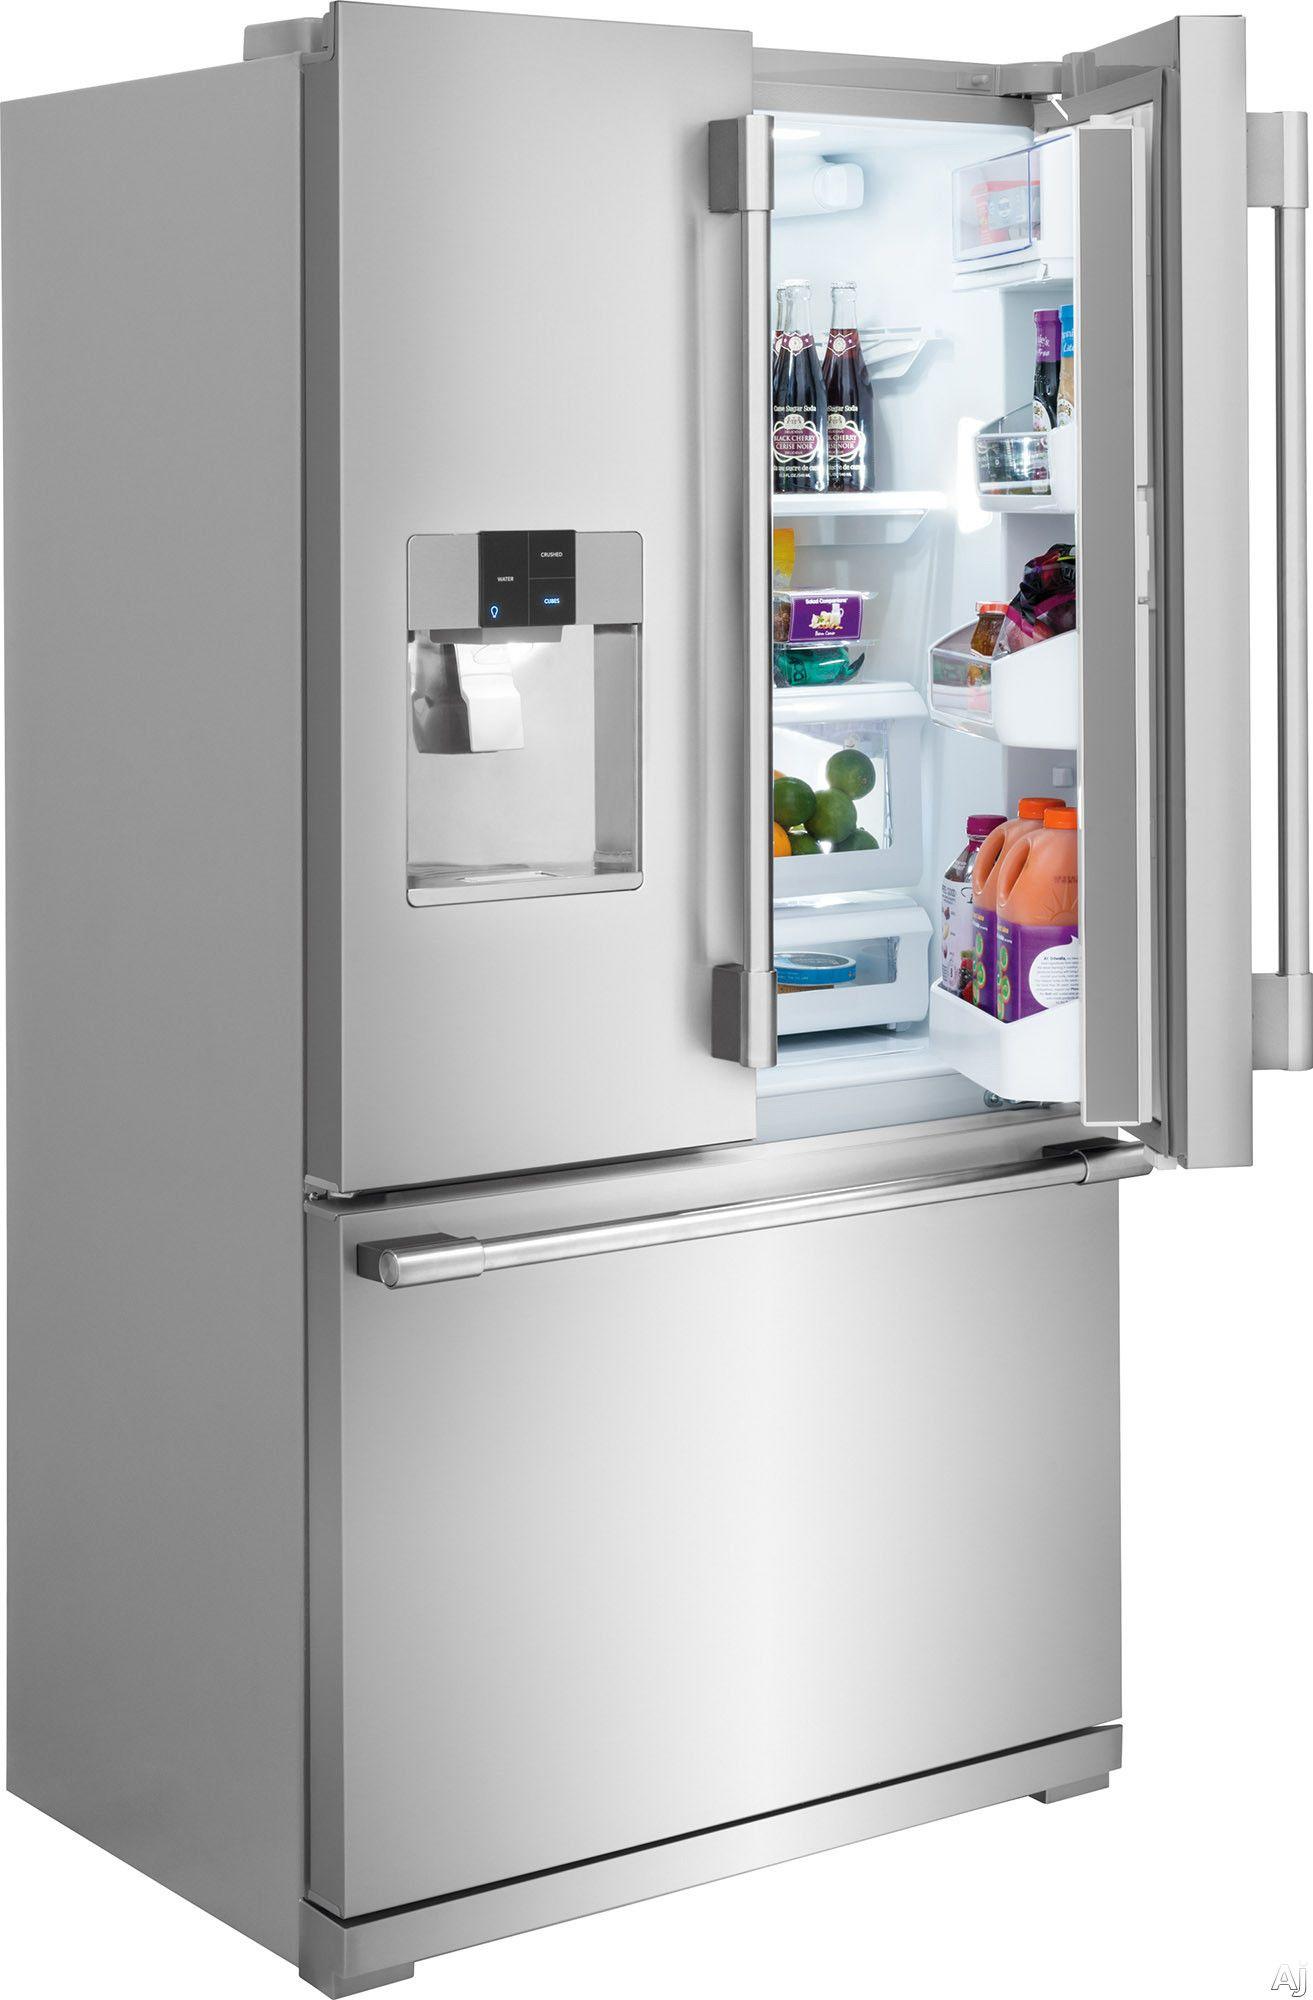 Genial Counter Depth French Door Refrigerator 28.5 Overall Depth